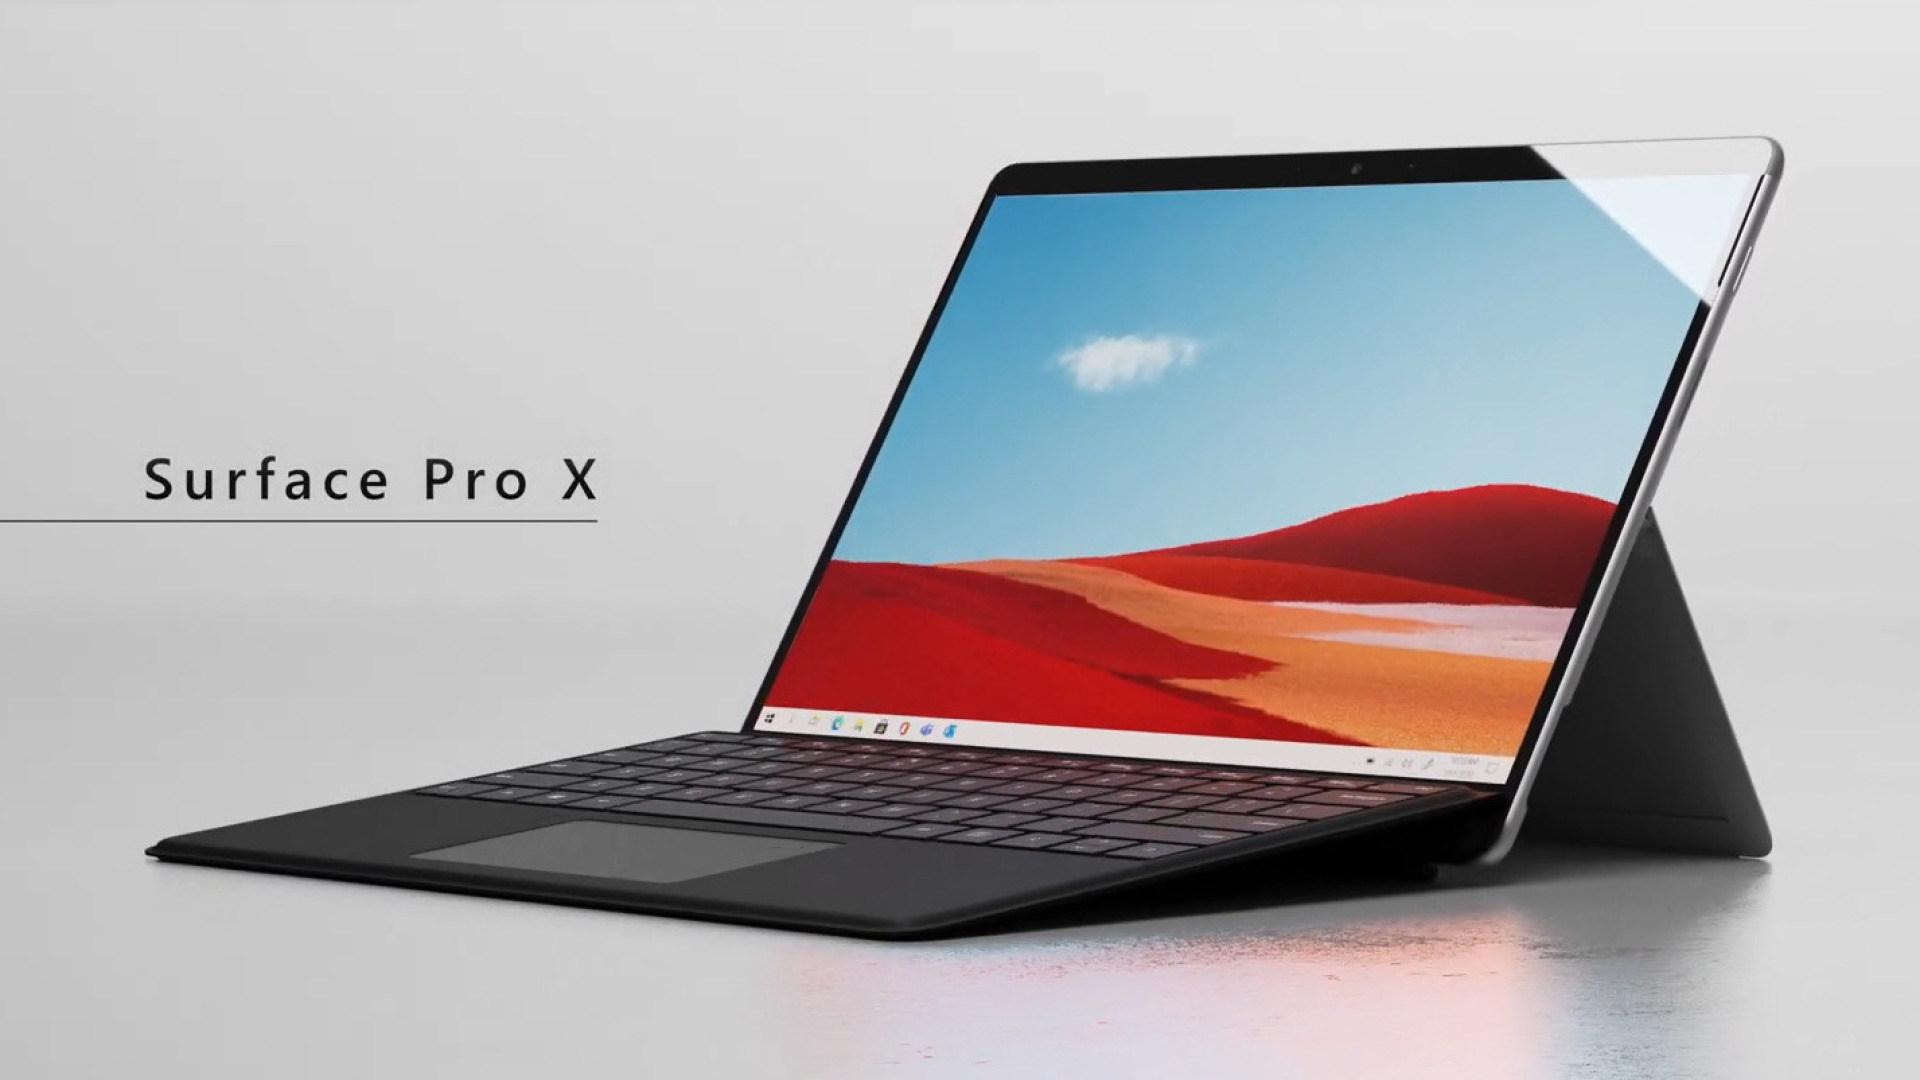 Microsoft, Tablet, Surface, Microsoft Surface, Surface Pro, Surface Tablet, Surface Pro X, Microsoft Surface Pro X